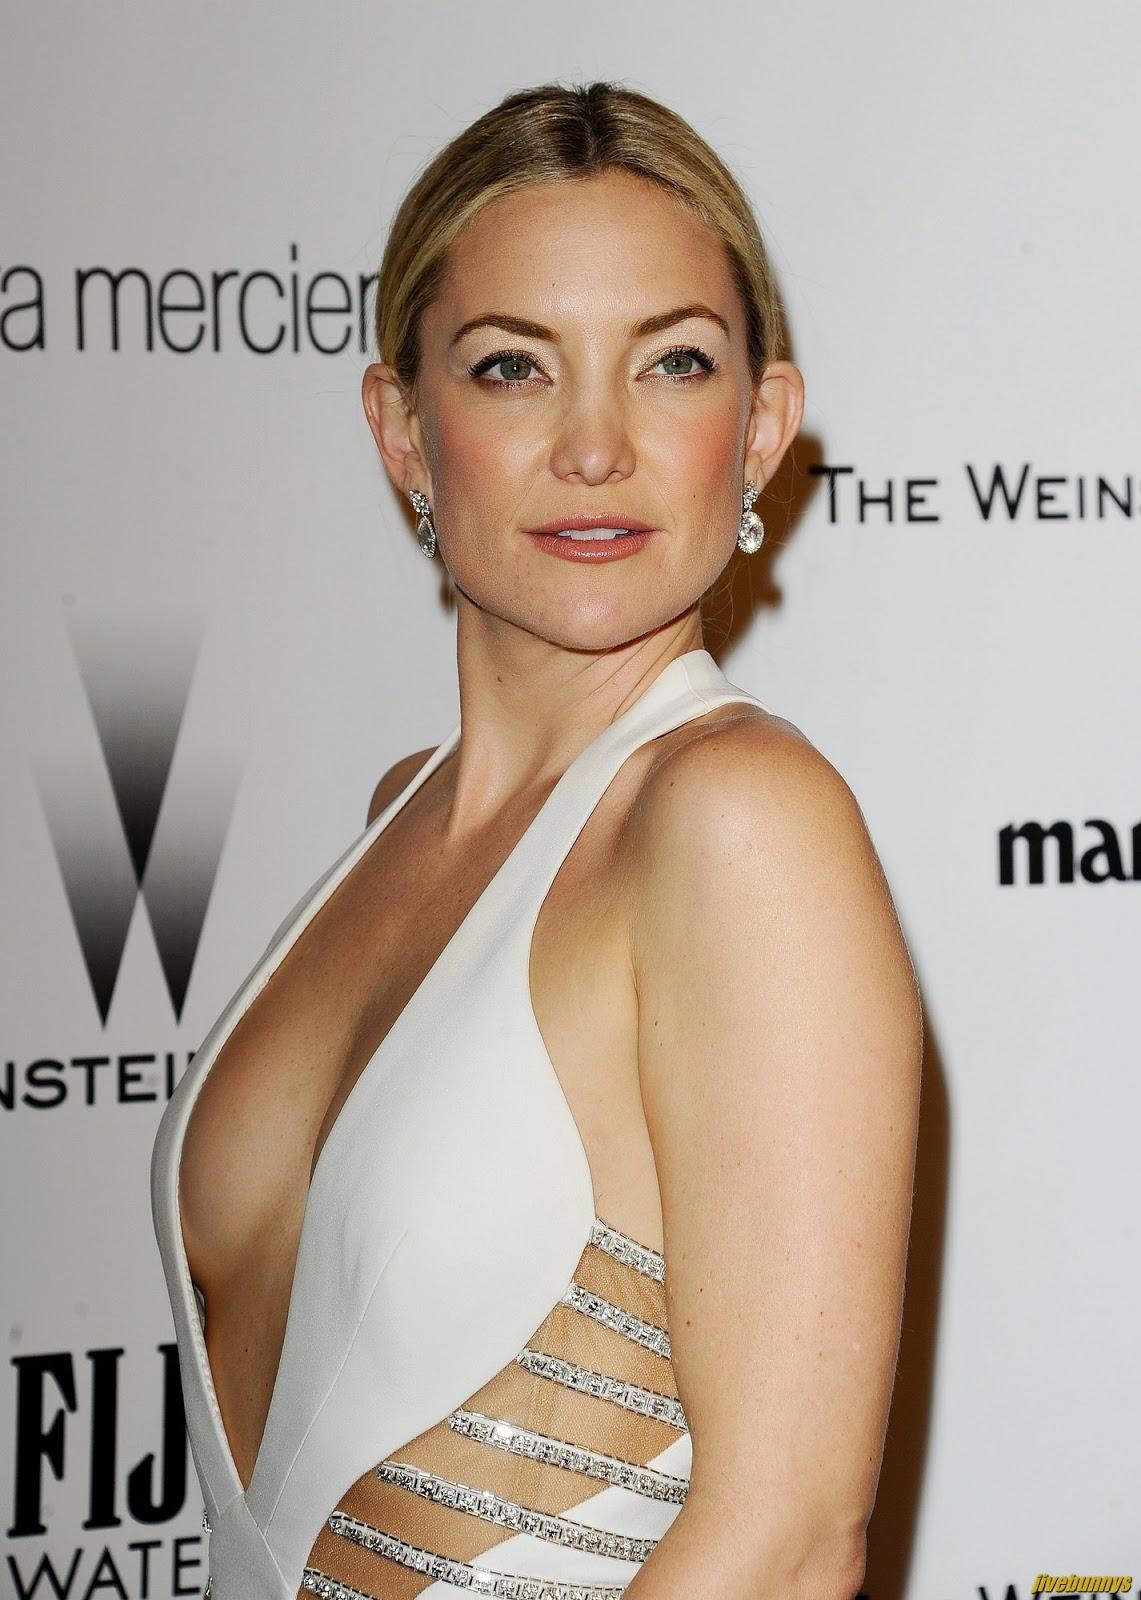 Jivebunnys Female Celebrity Picture Gallery: Kate Hudson ... Kate Hudson Movies